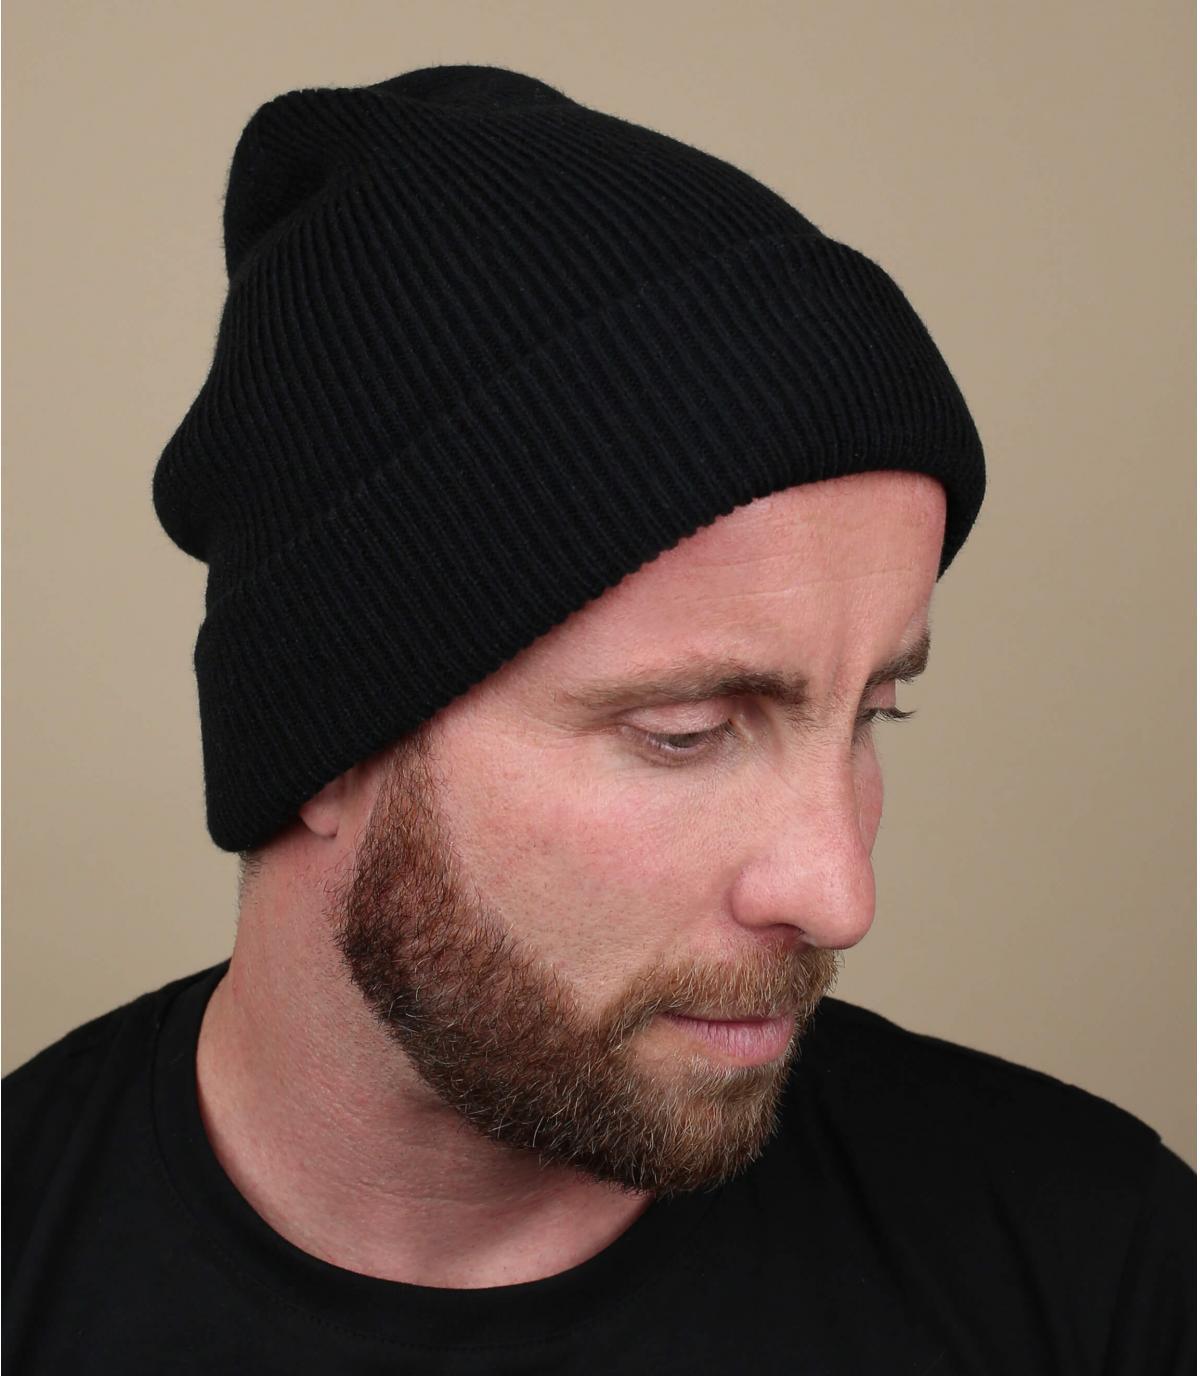 Schwazre oversize Mütze